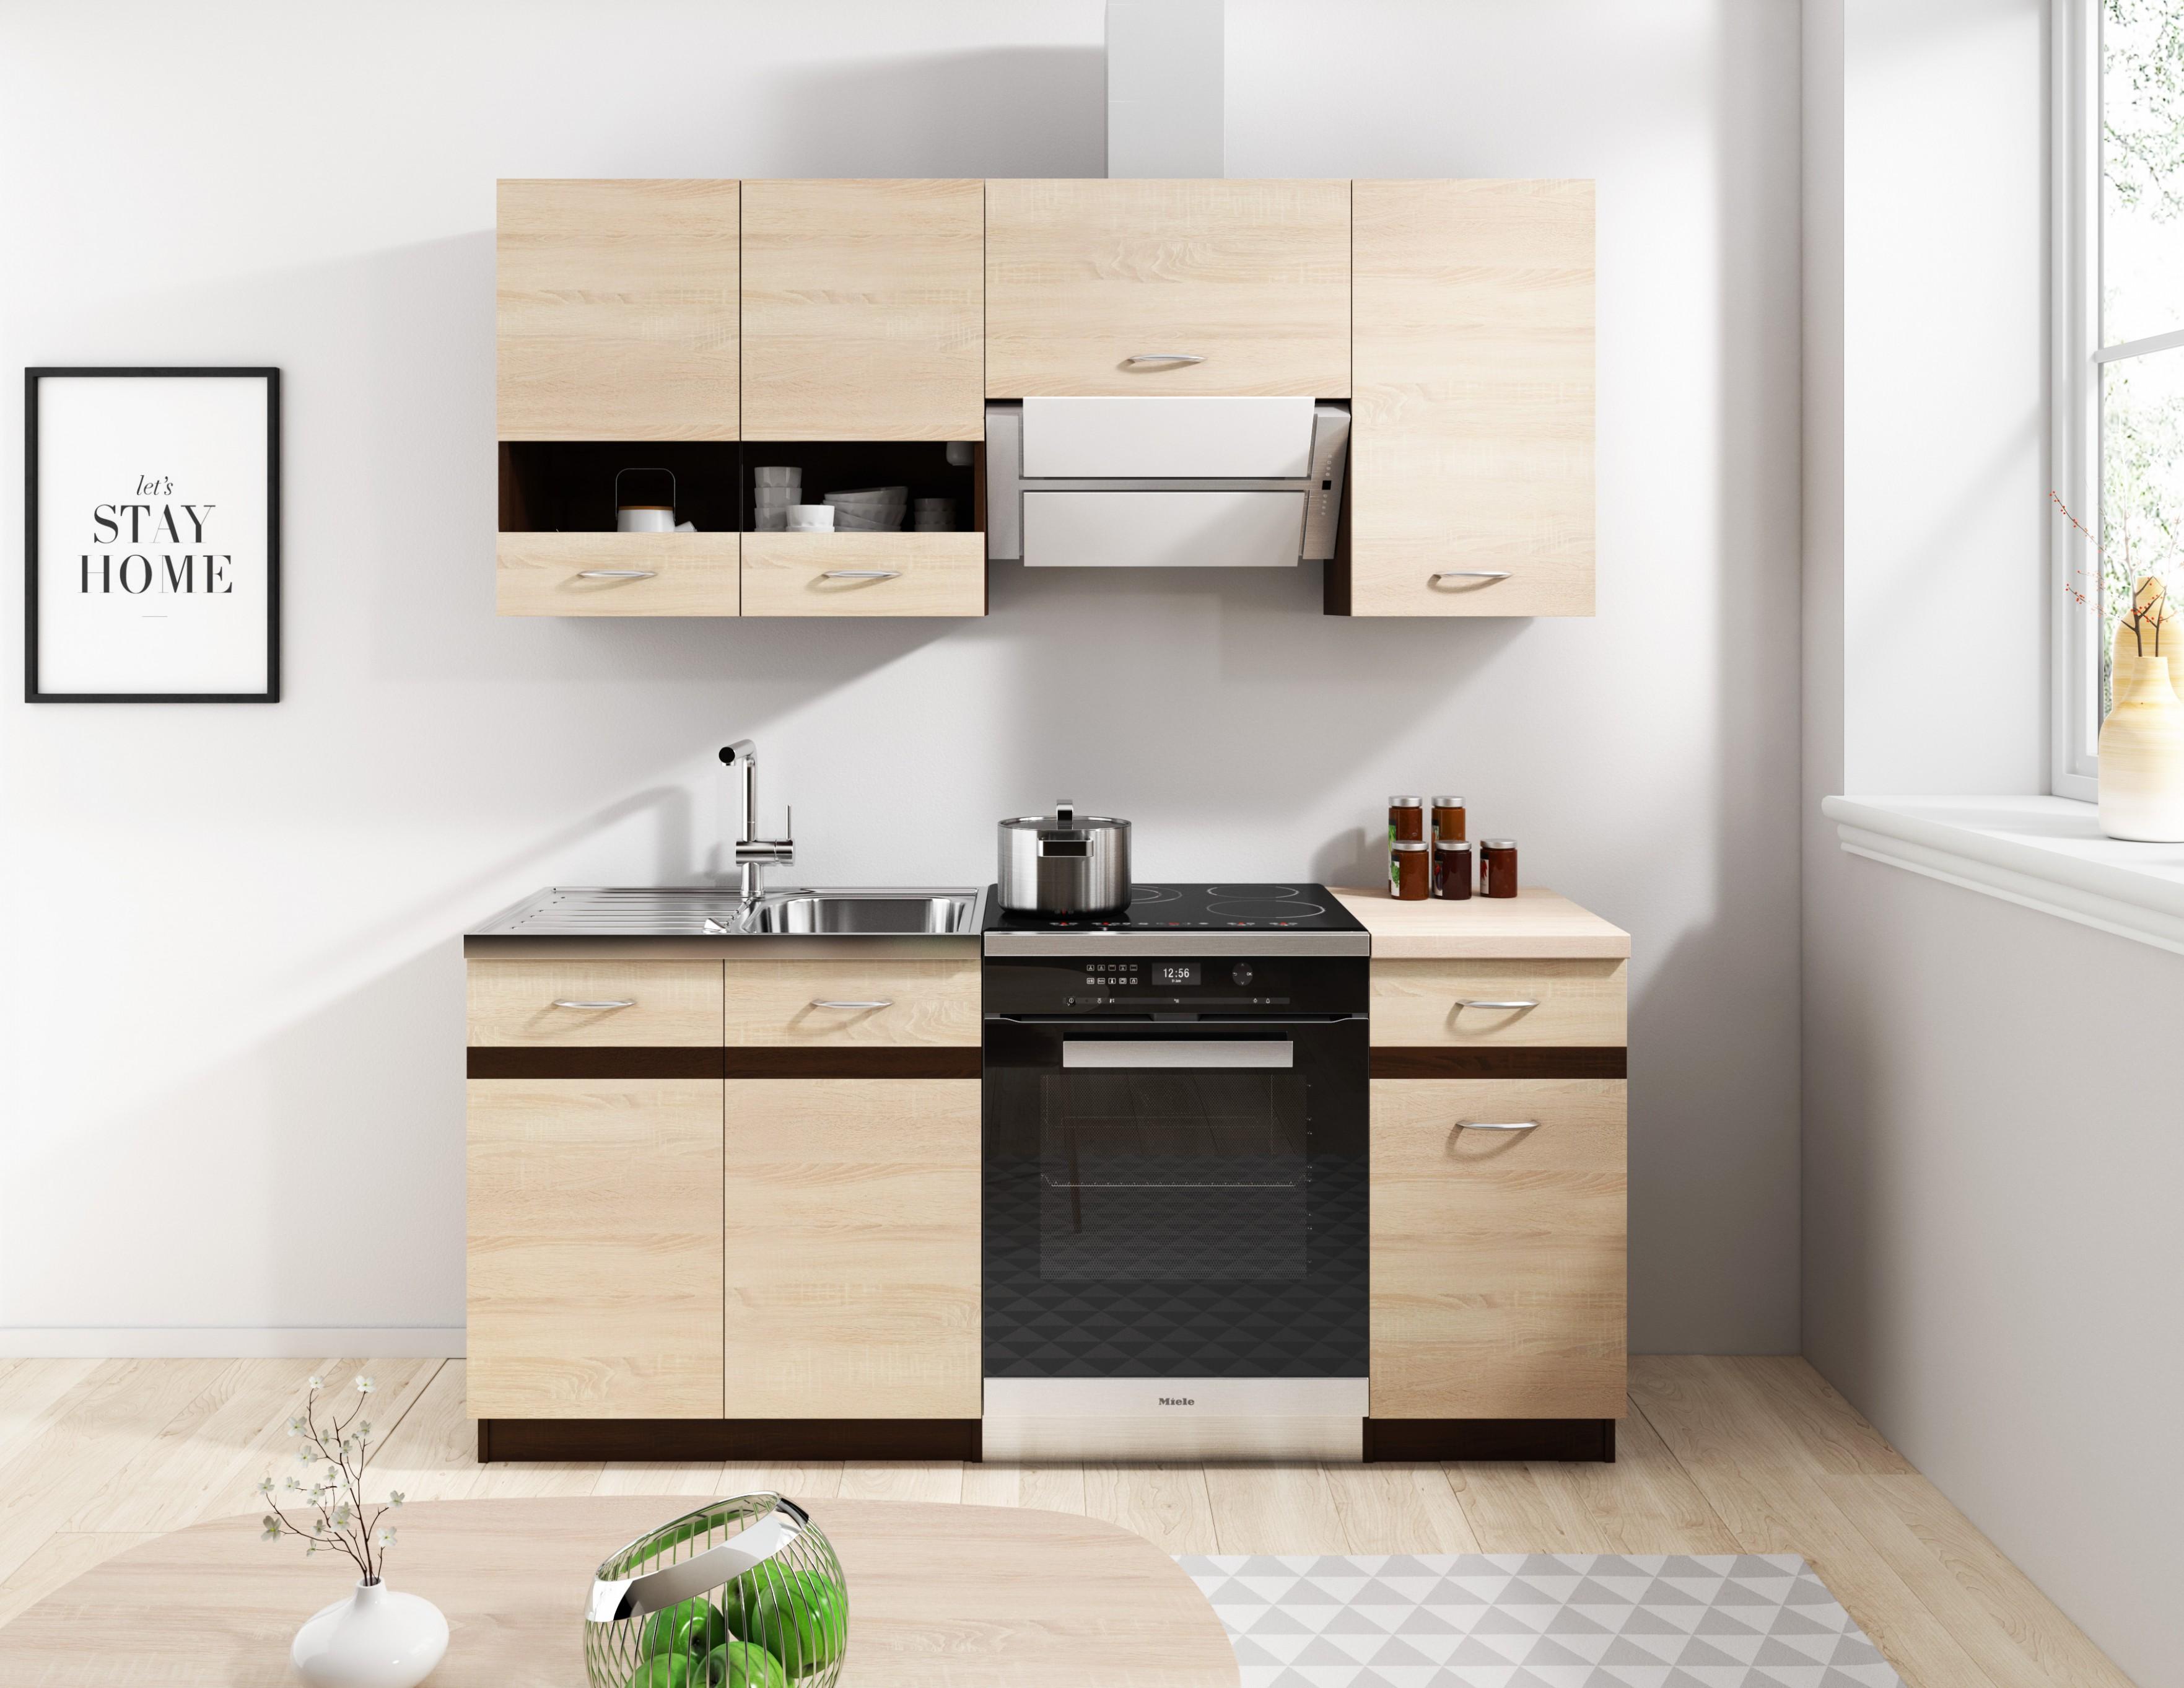 Kuchyne 53 cm | Sleviste.cz